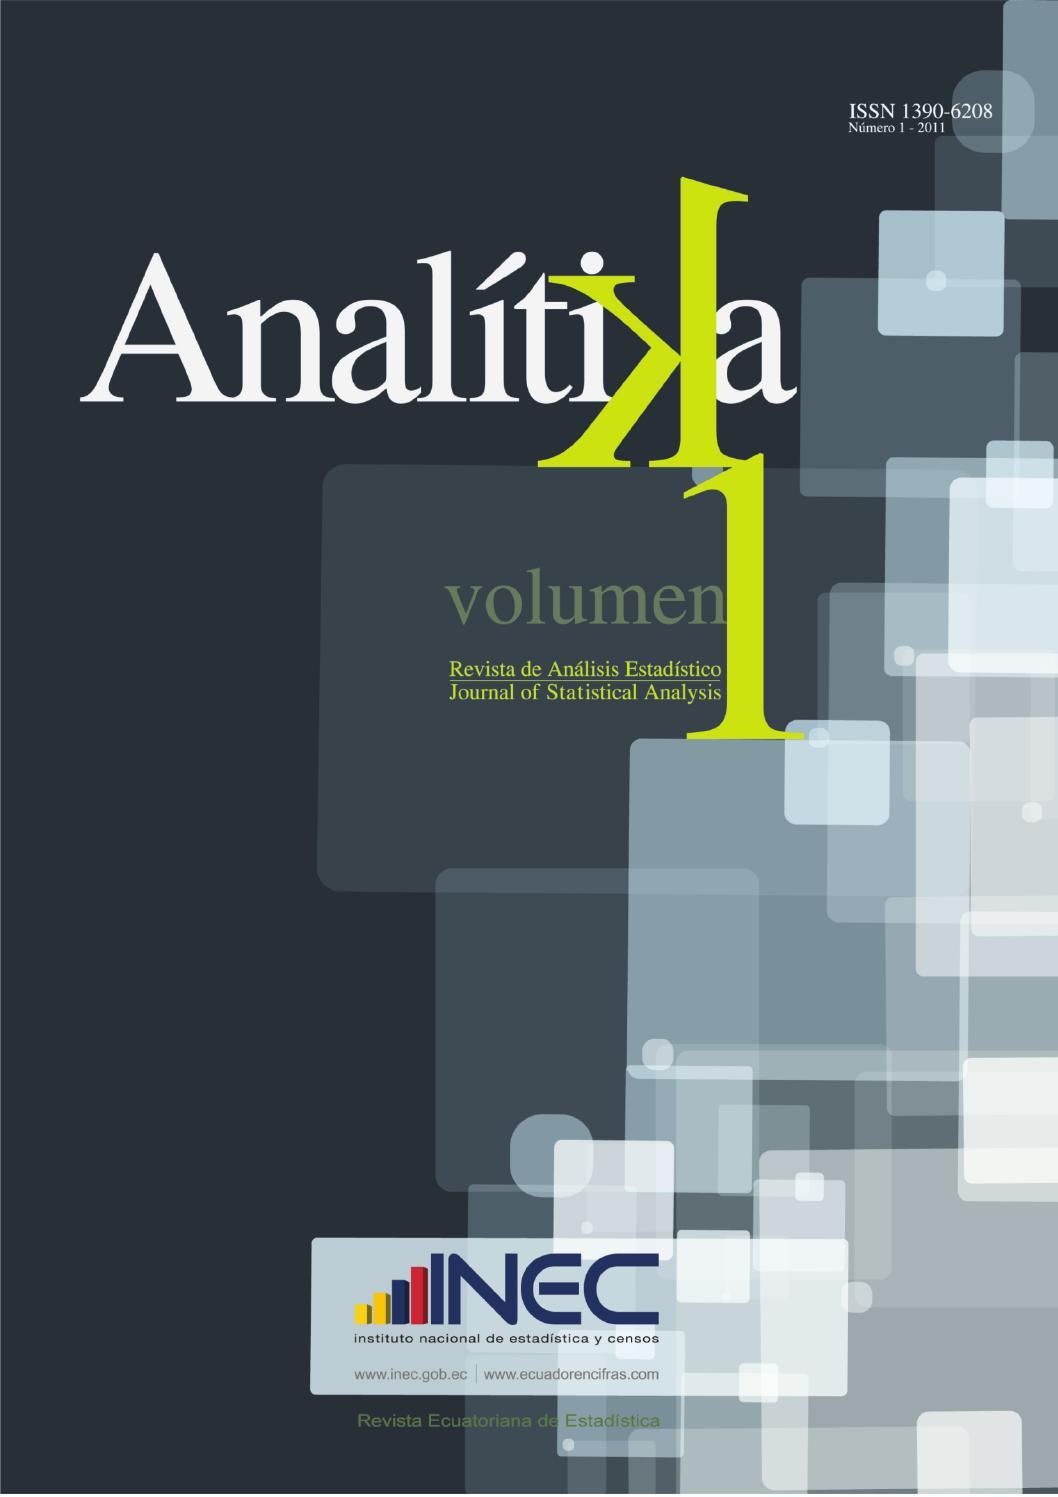 anal237tika 1 by anal237tika issuu